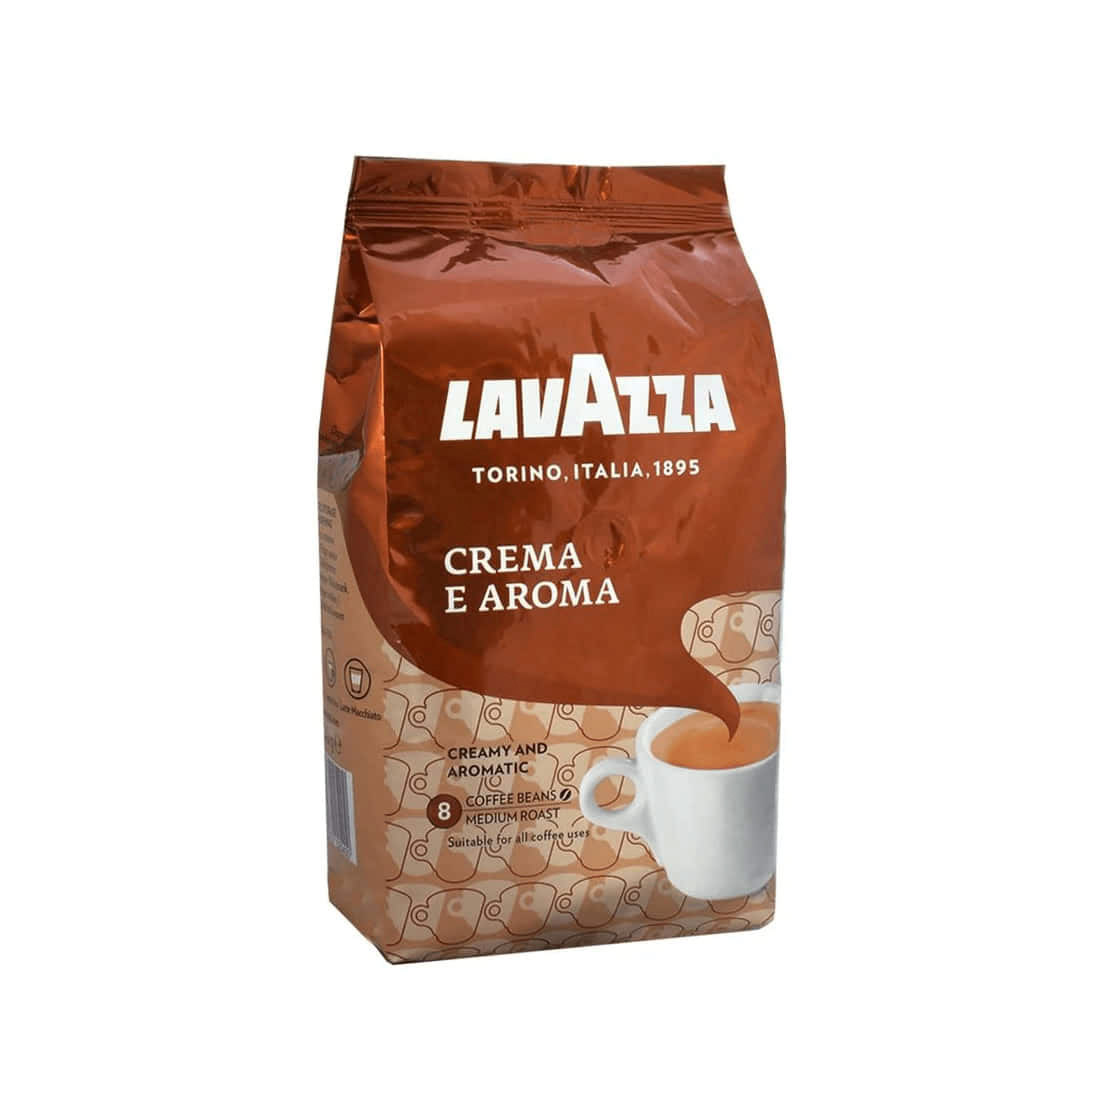 Кофе в зернах Lavazza Crema e Aroma 1 кг кофе в зернах lavazza qualita rossa 1 кг